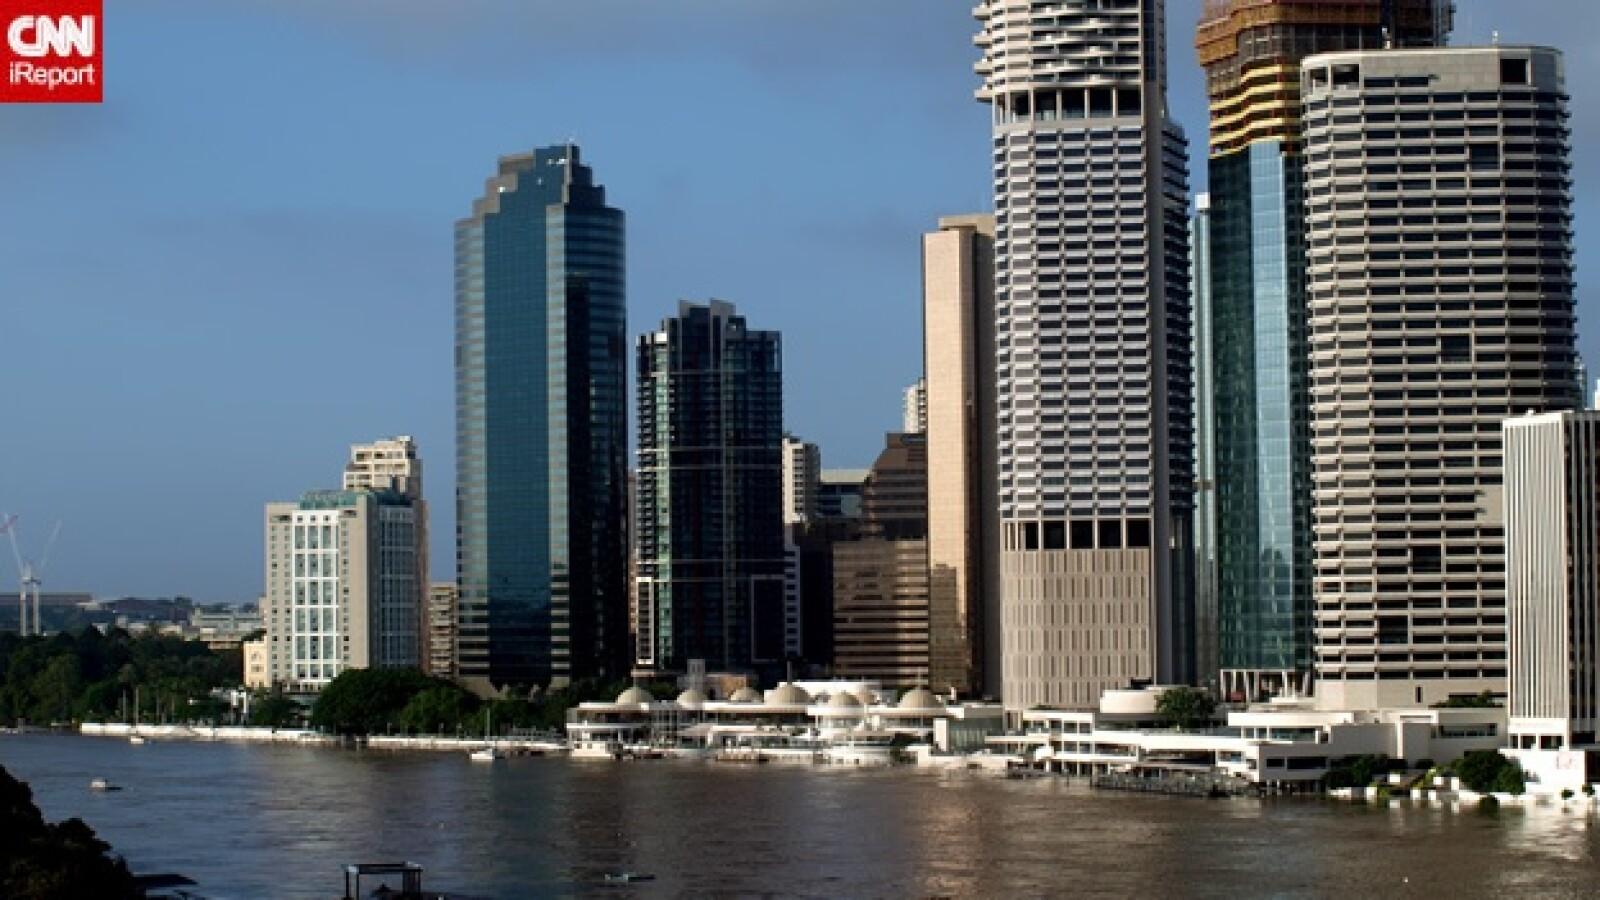 irpt-inundaciones-australia2.1